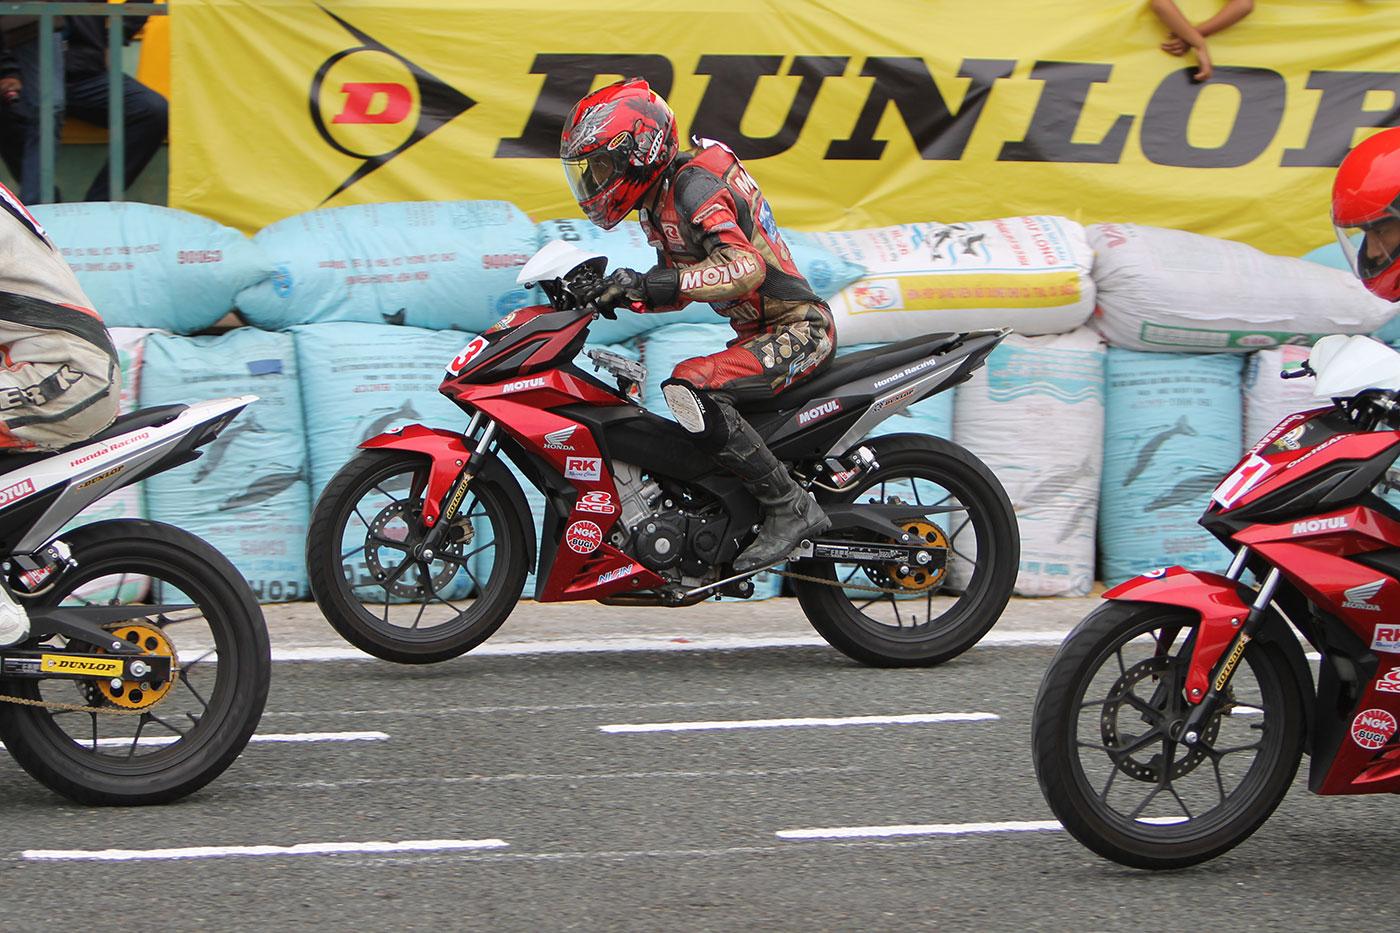 tay-dua-nguyen-thanh-vu-honda-racing-05.jpg